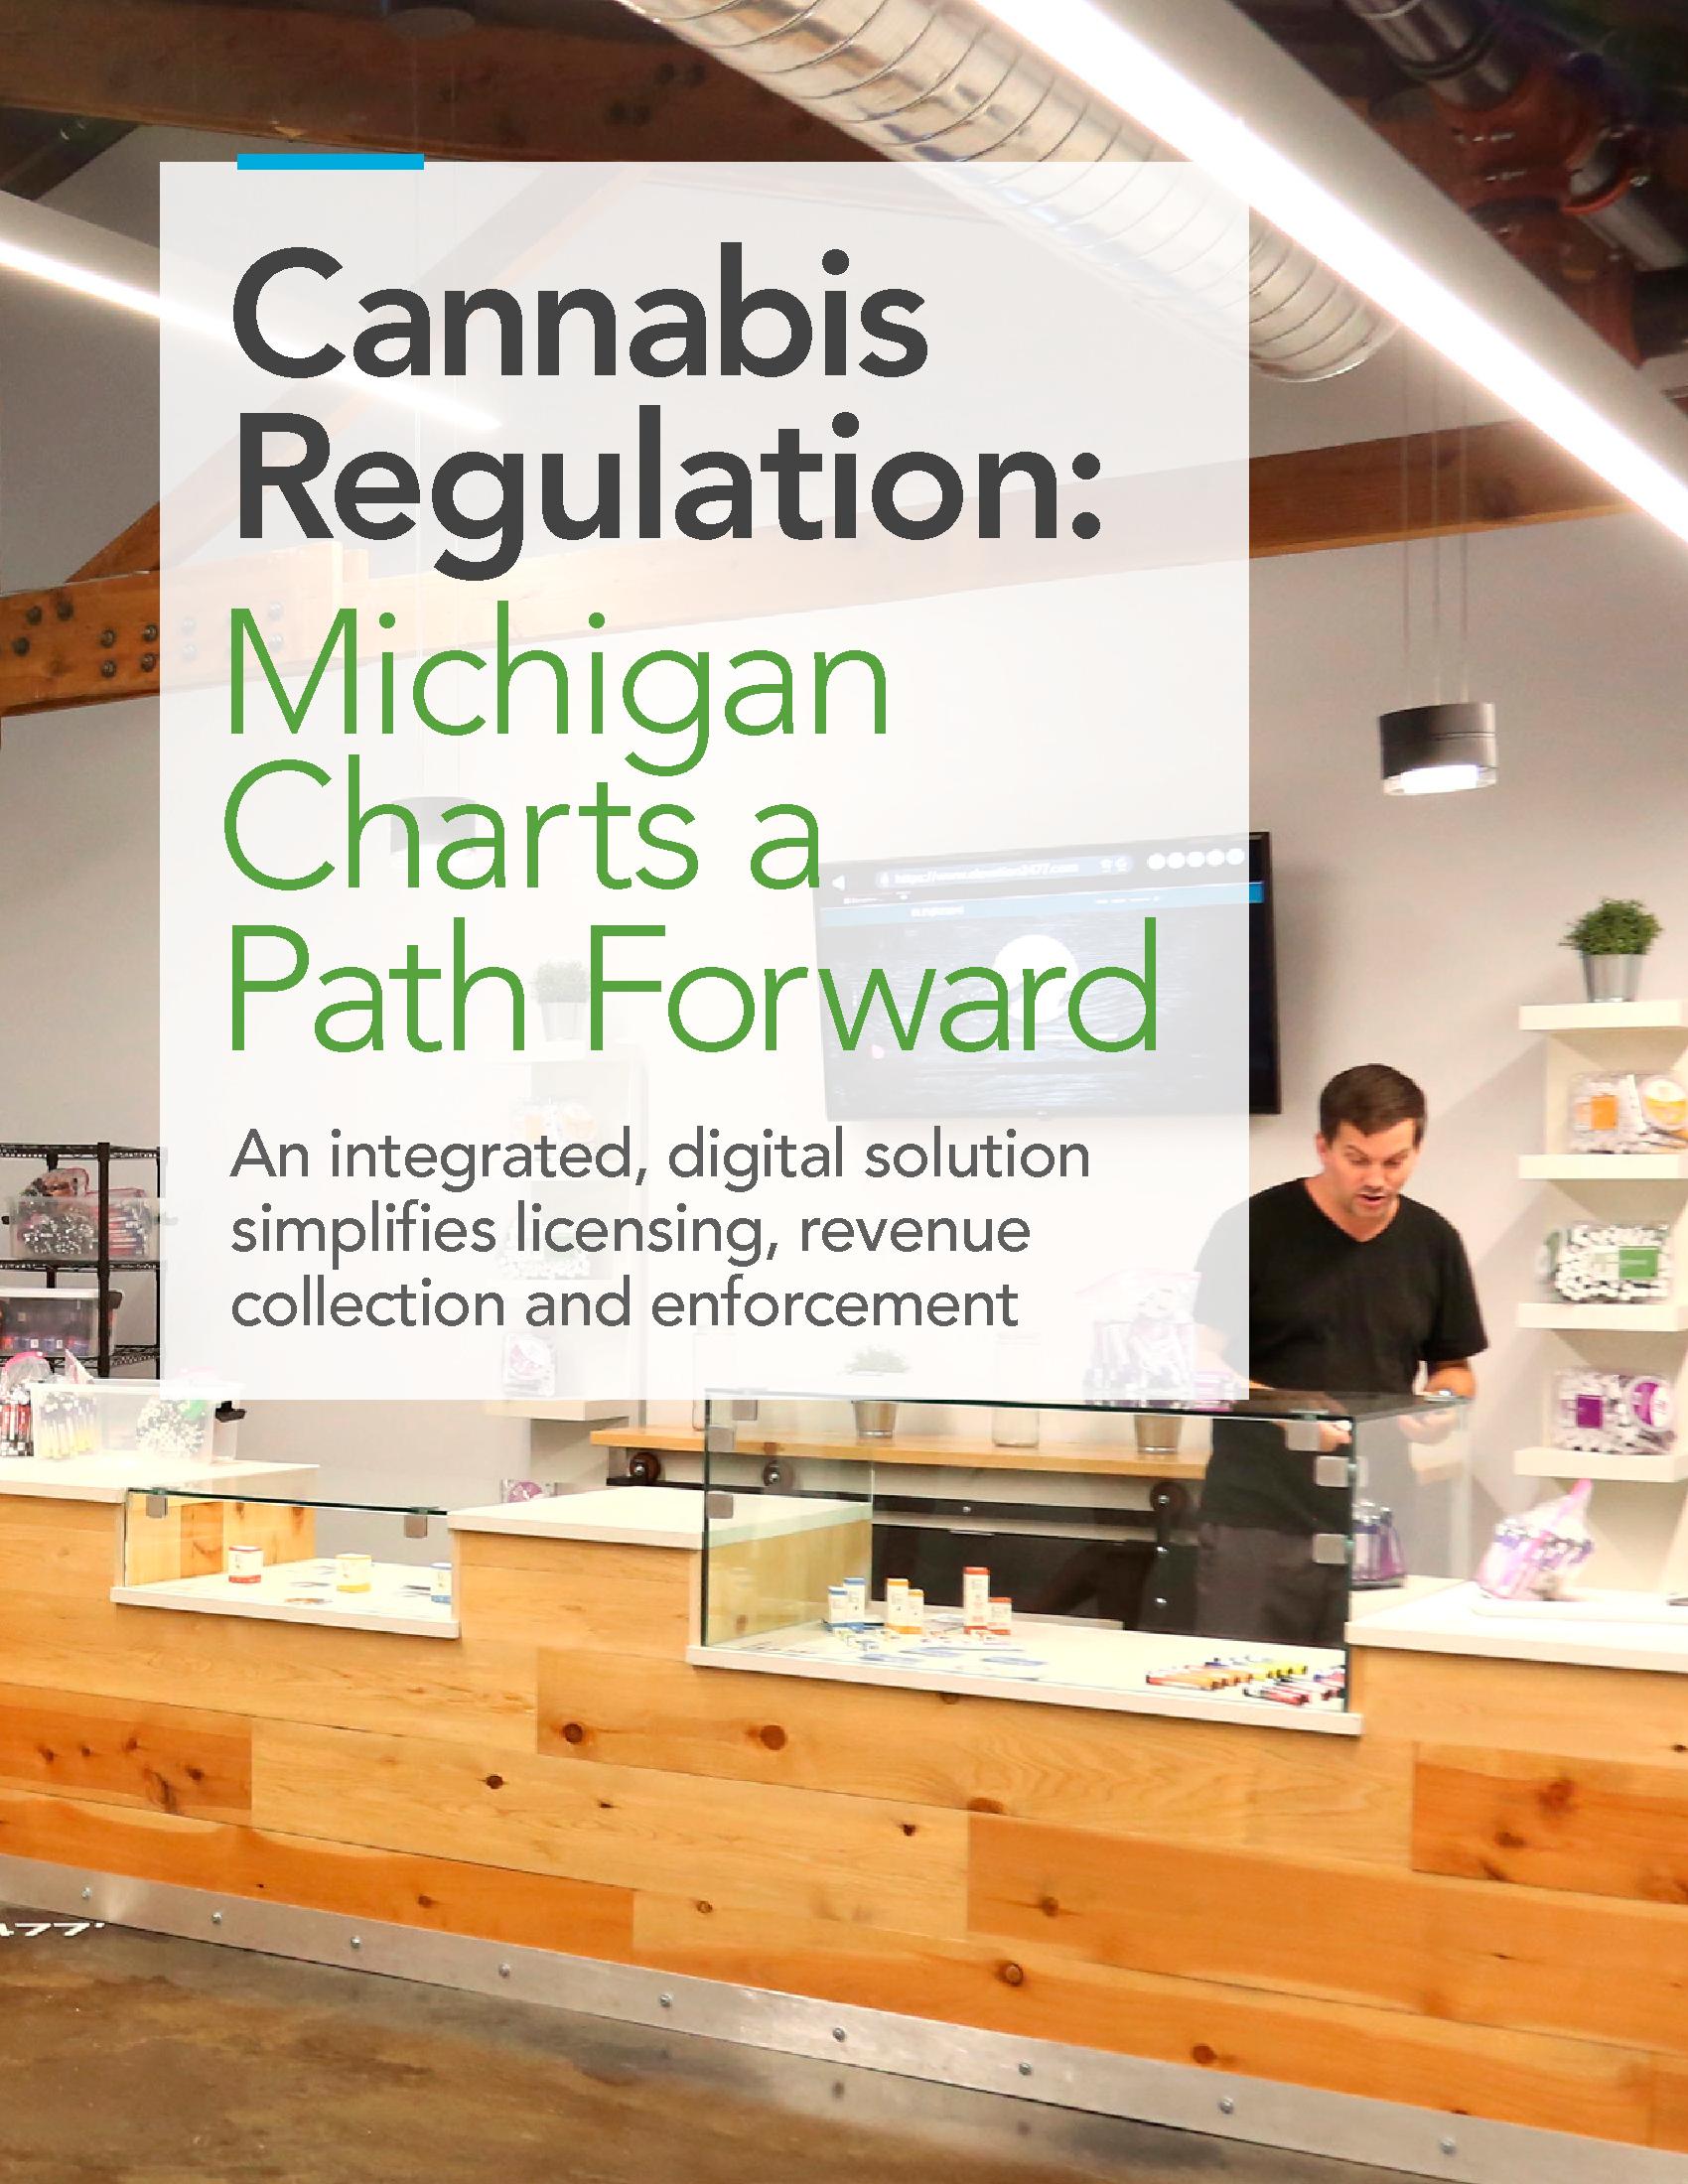 GOV - Accela - TLP - 181130 - Cannabis Regulation